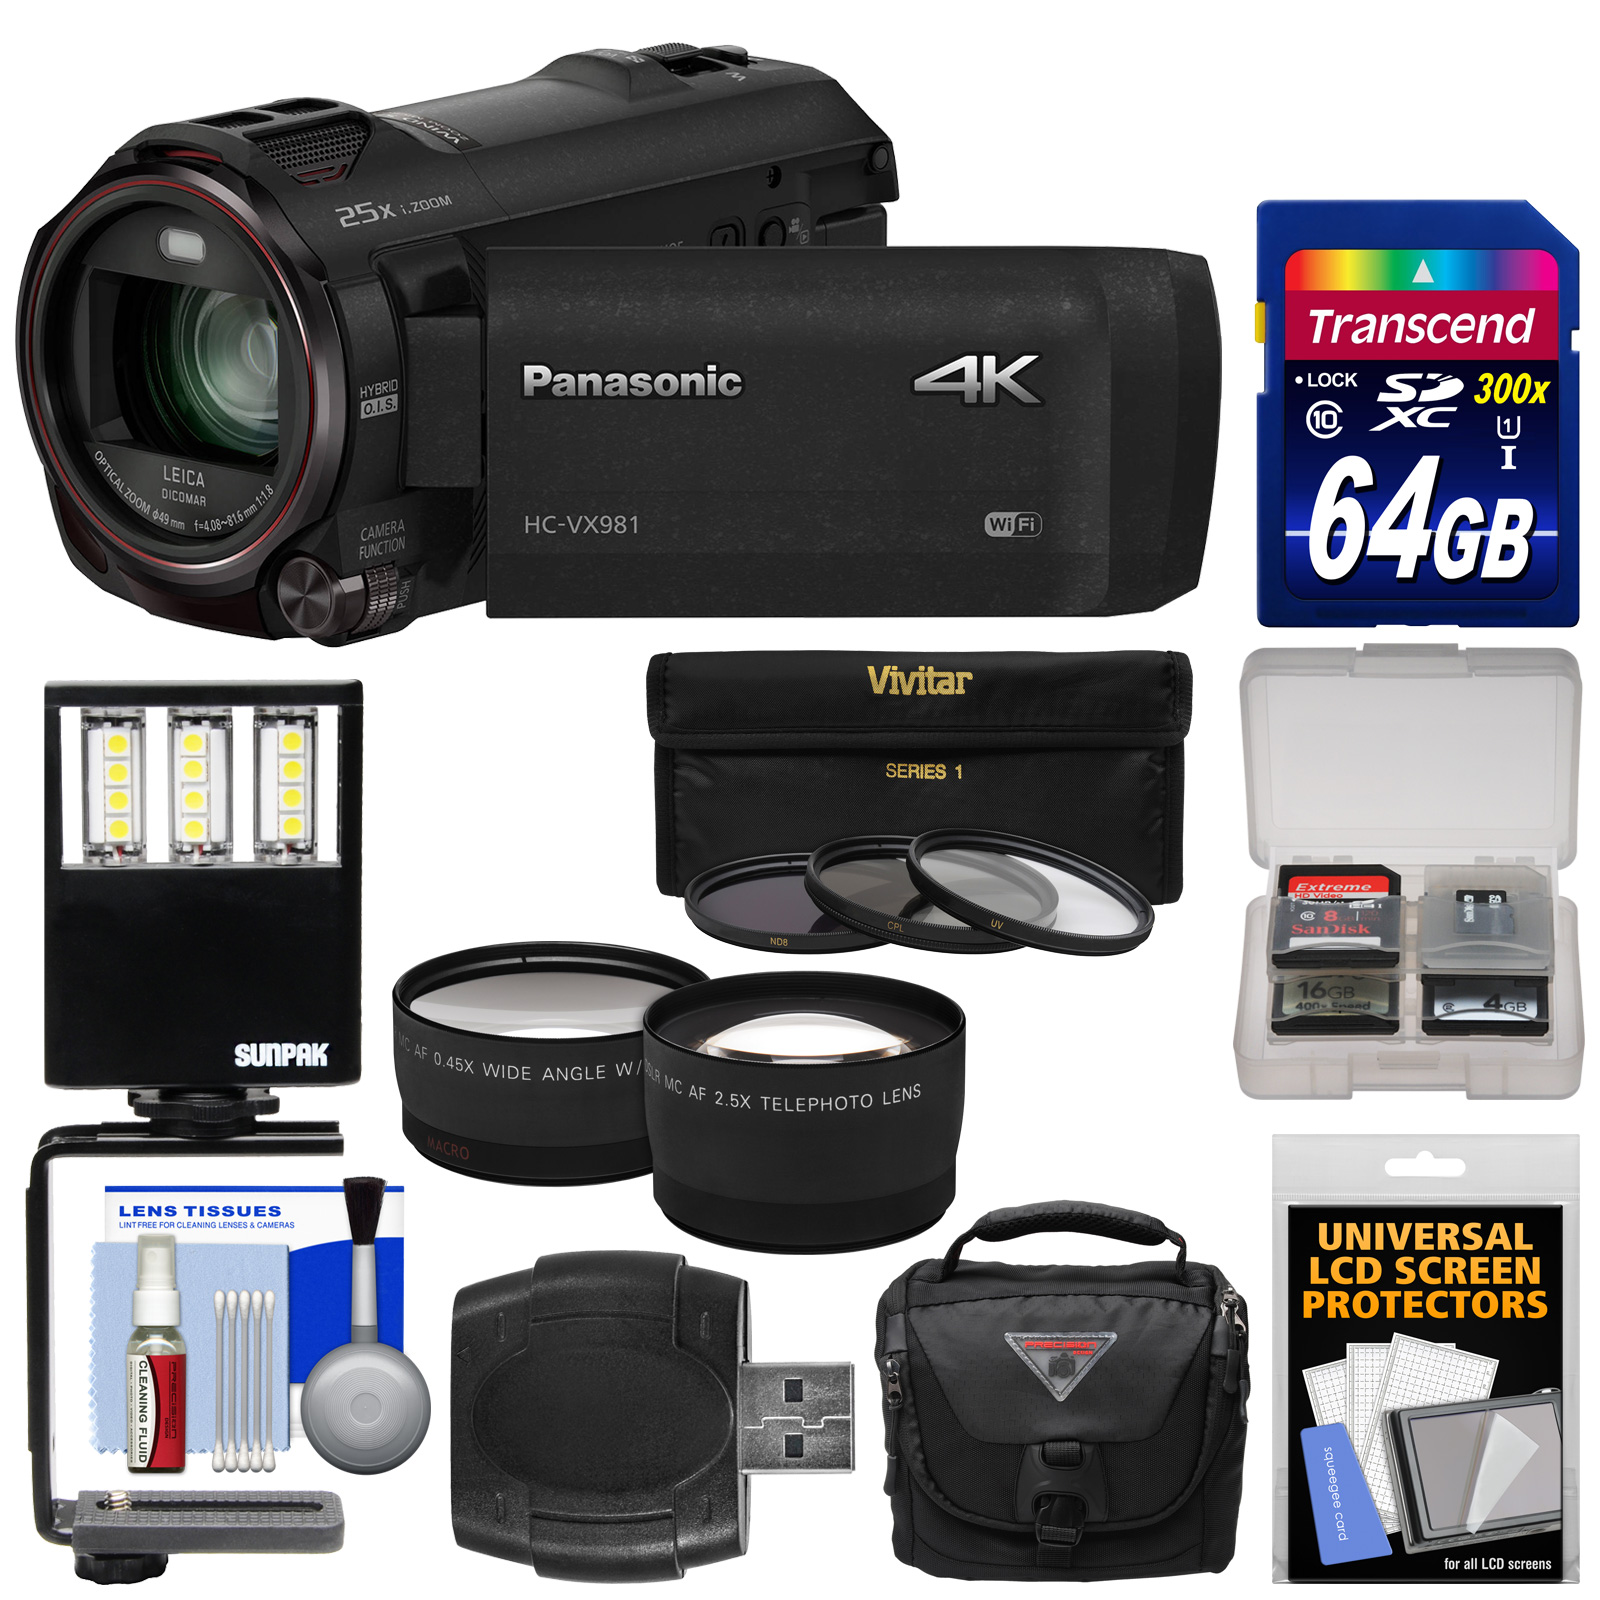 Panasonic HC-VX981 Wi-Fi 4K Ultra HD Video Camera Camcord...